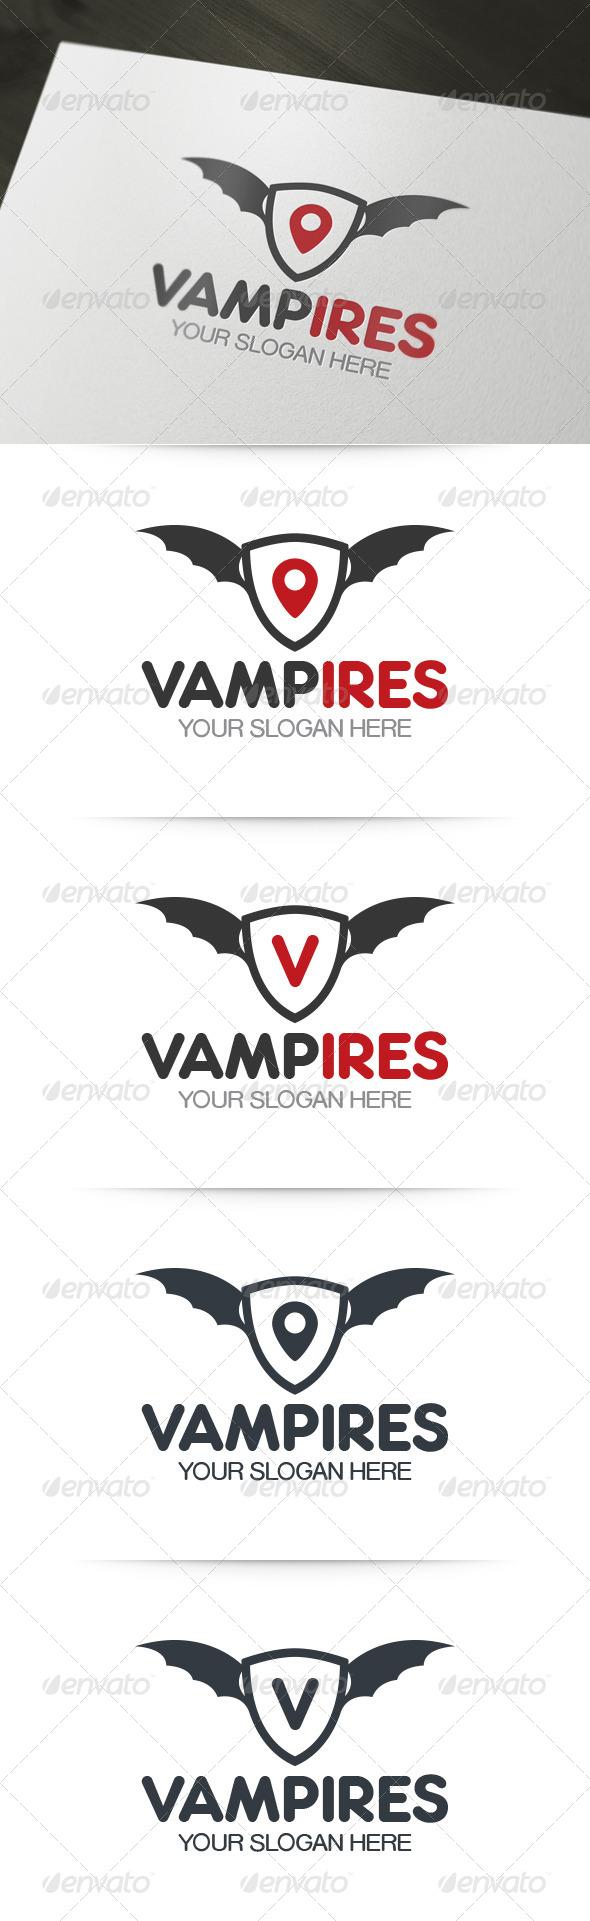 GraphicRiver Vampires Logo 6153766